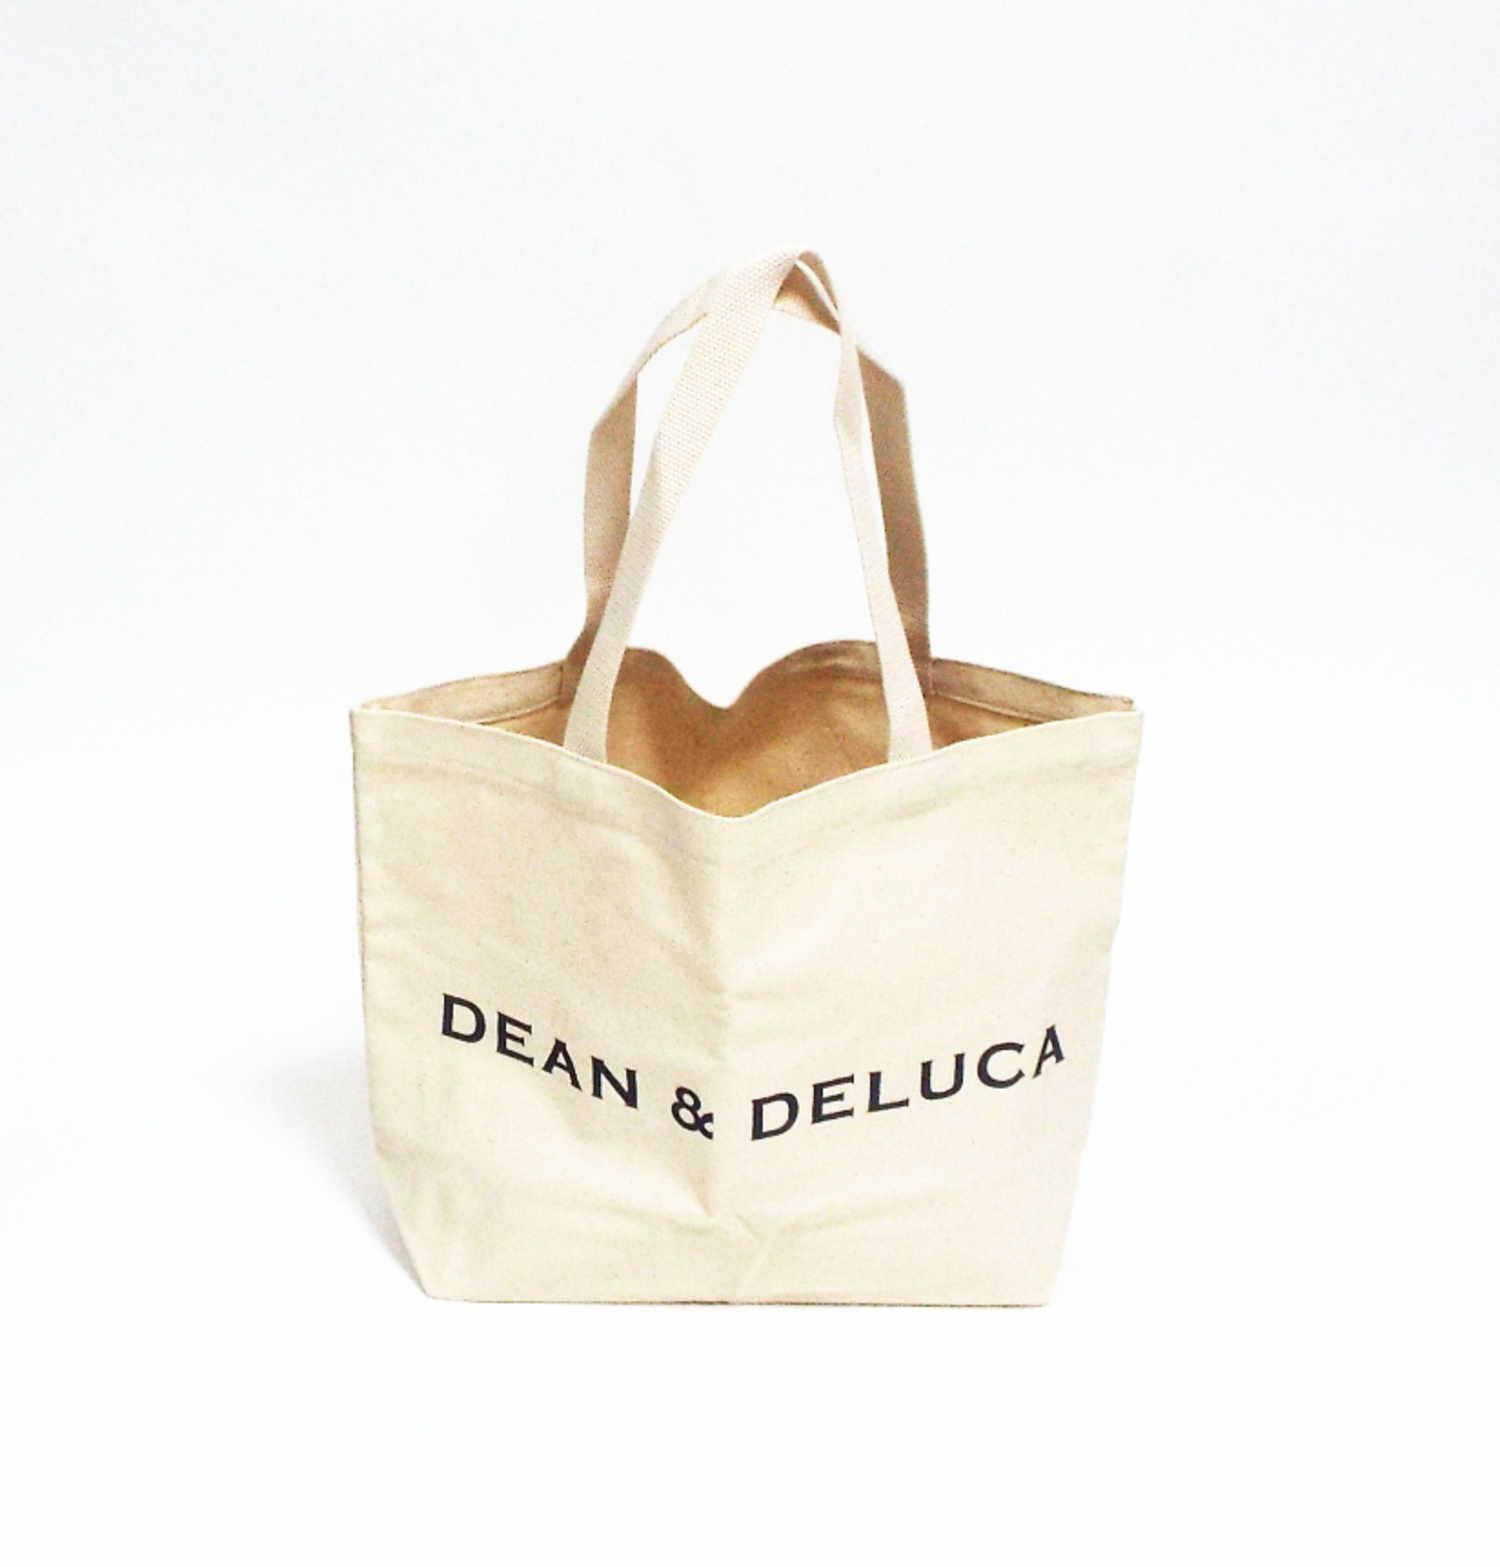 DEAN&DELUCA トートバック ナチュラル Lサイズ